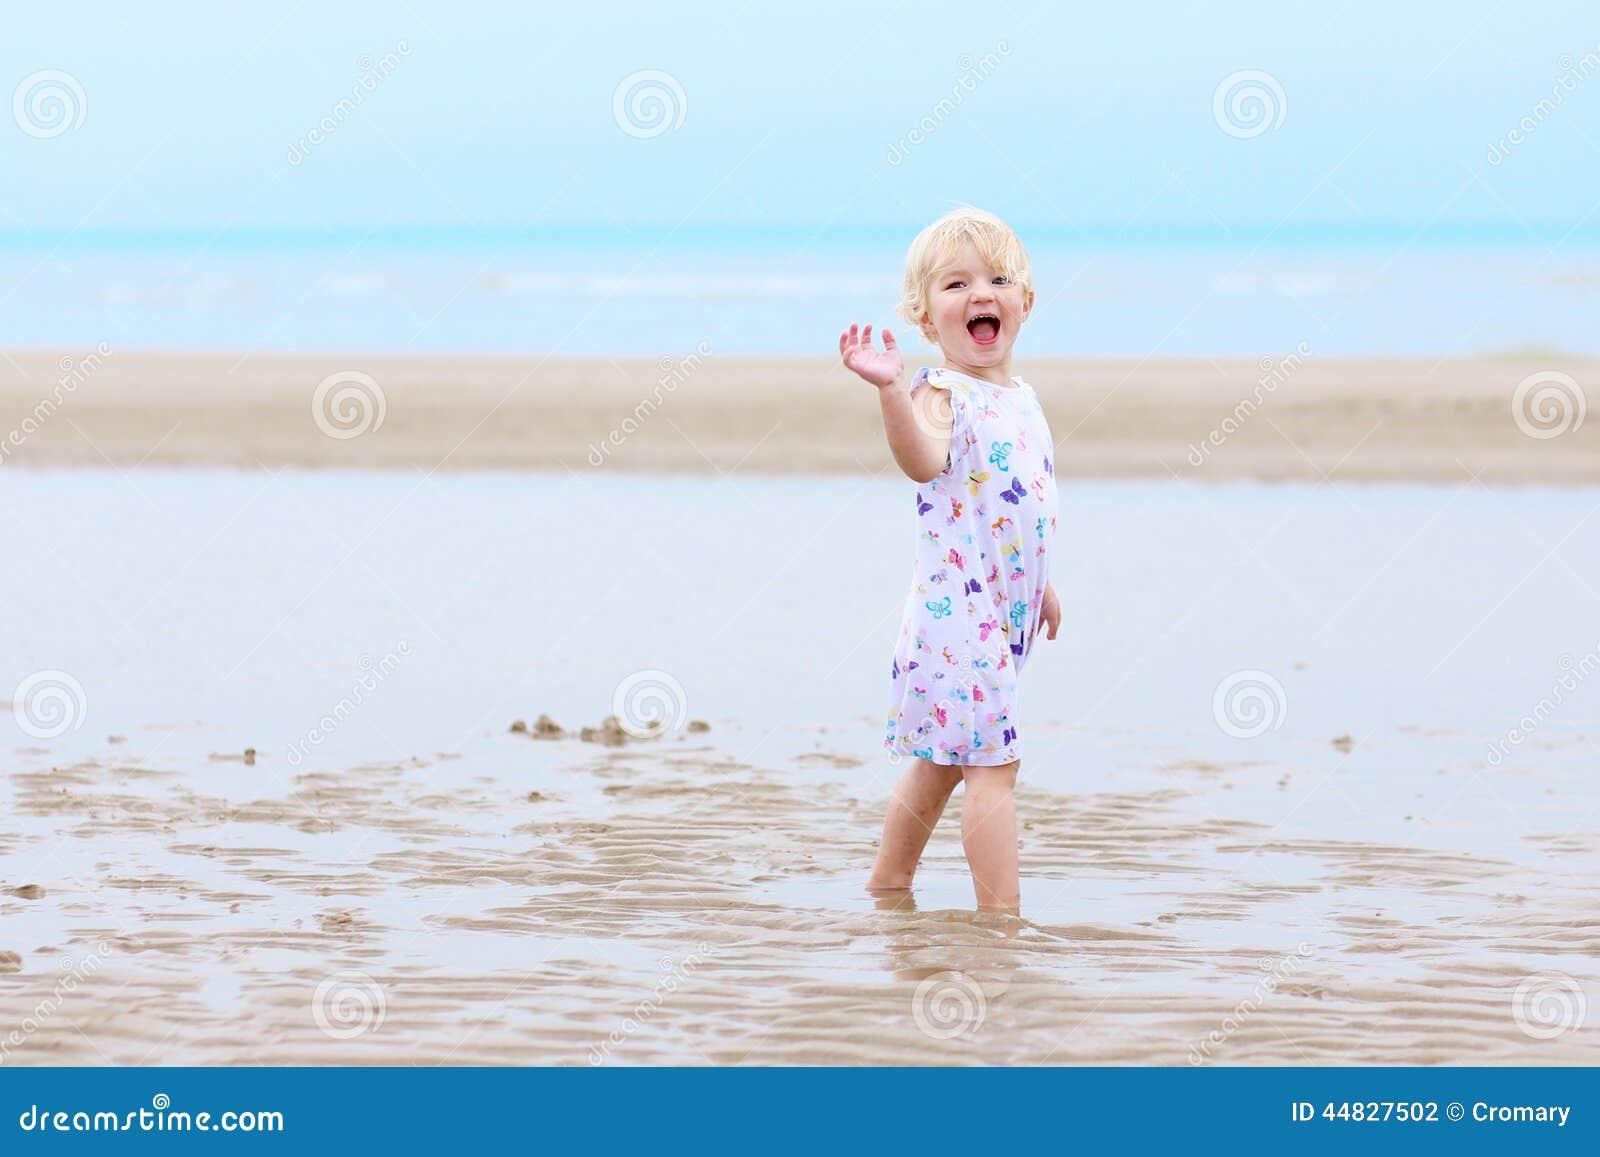 Little girl pussy on the beach